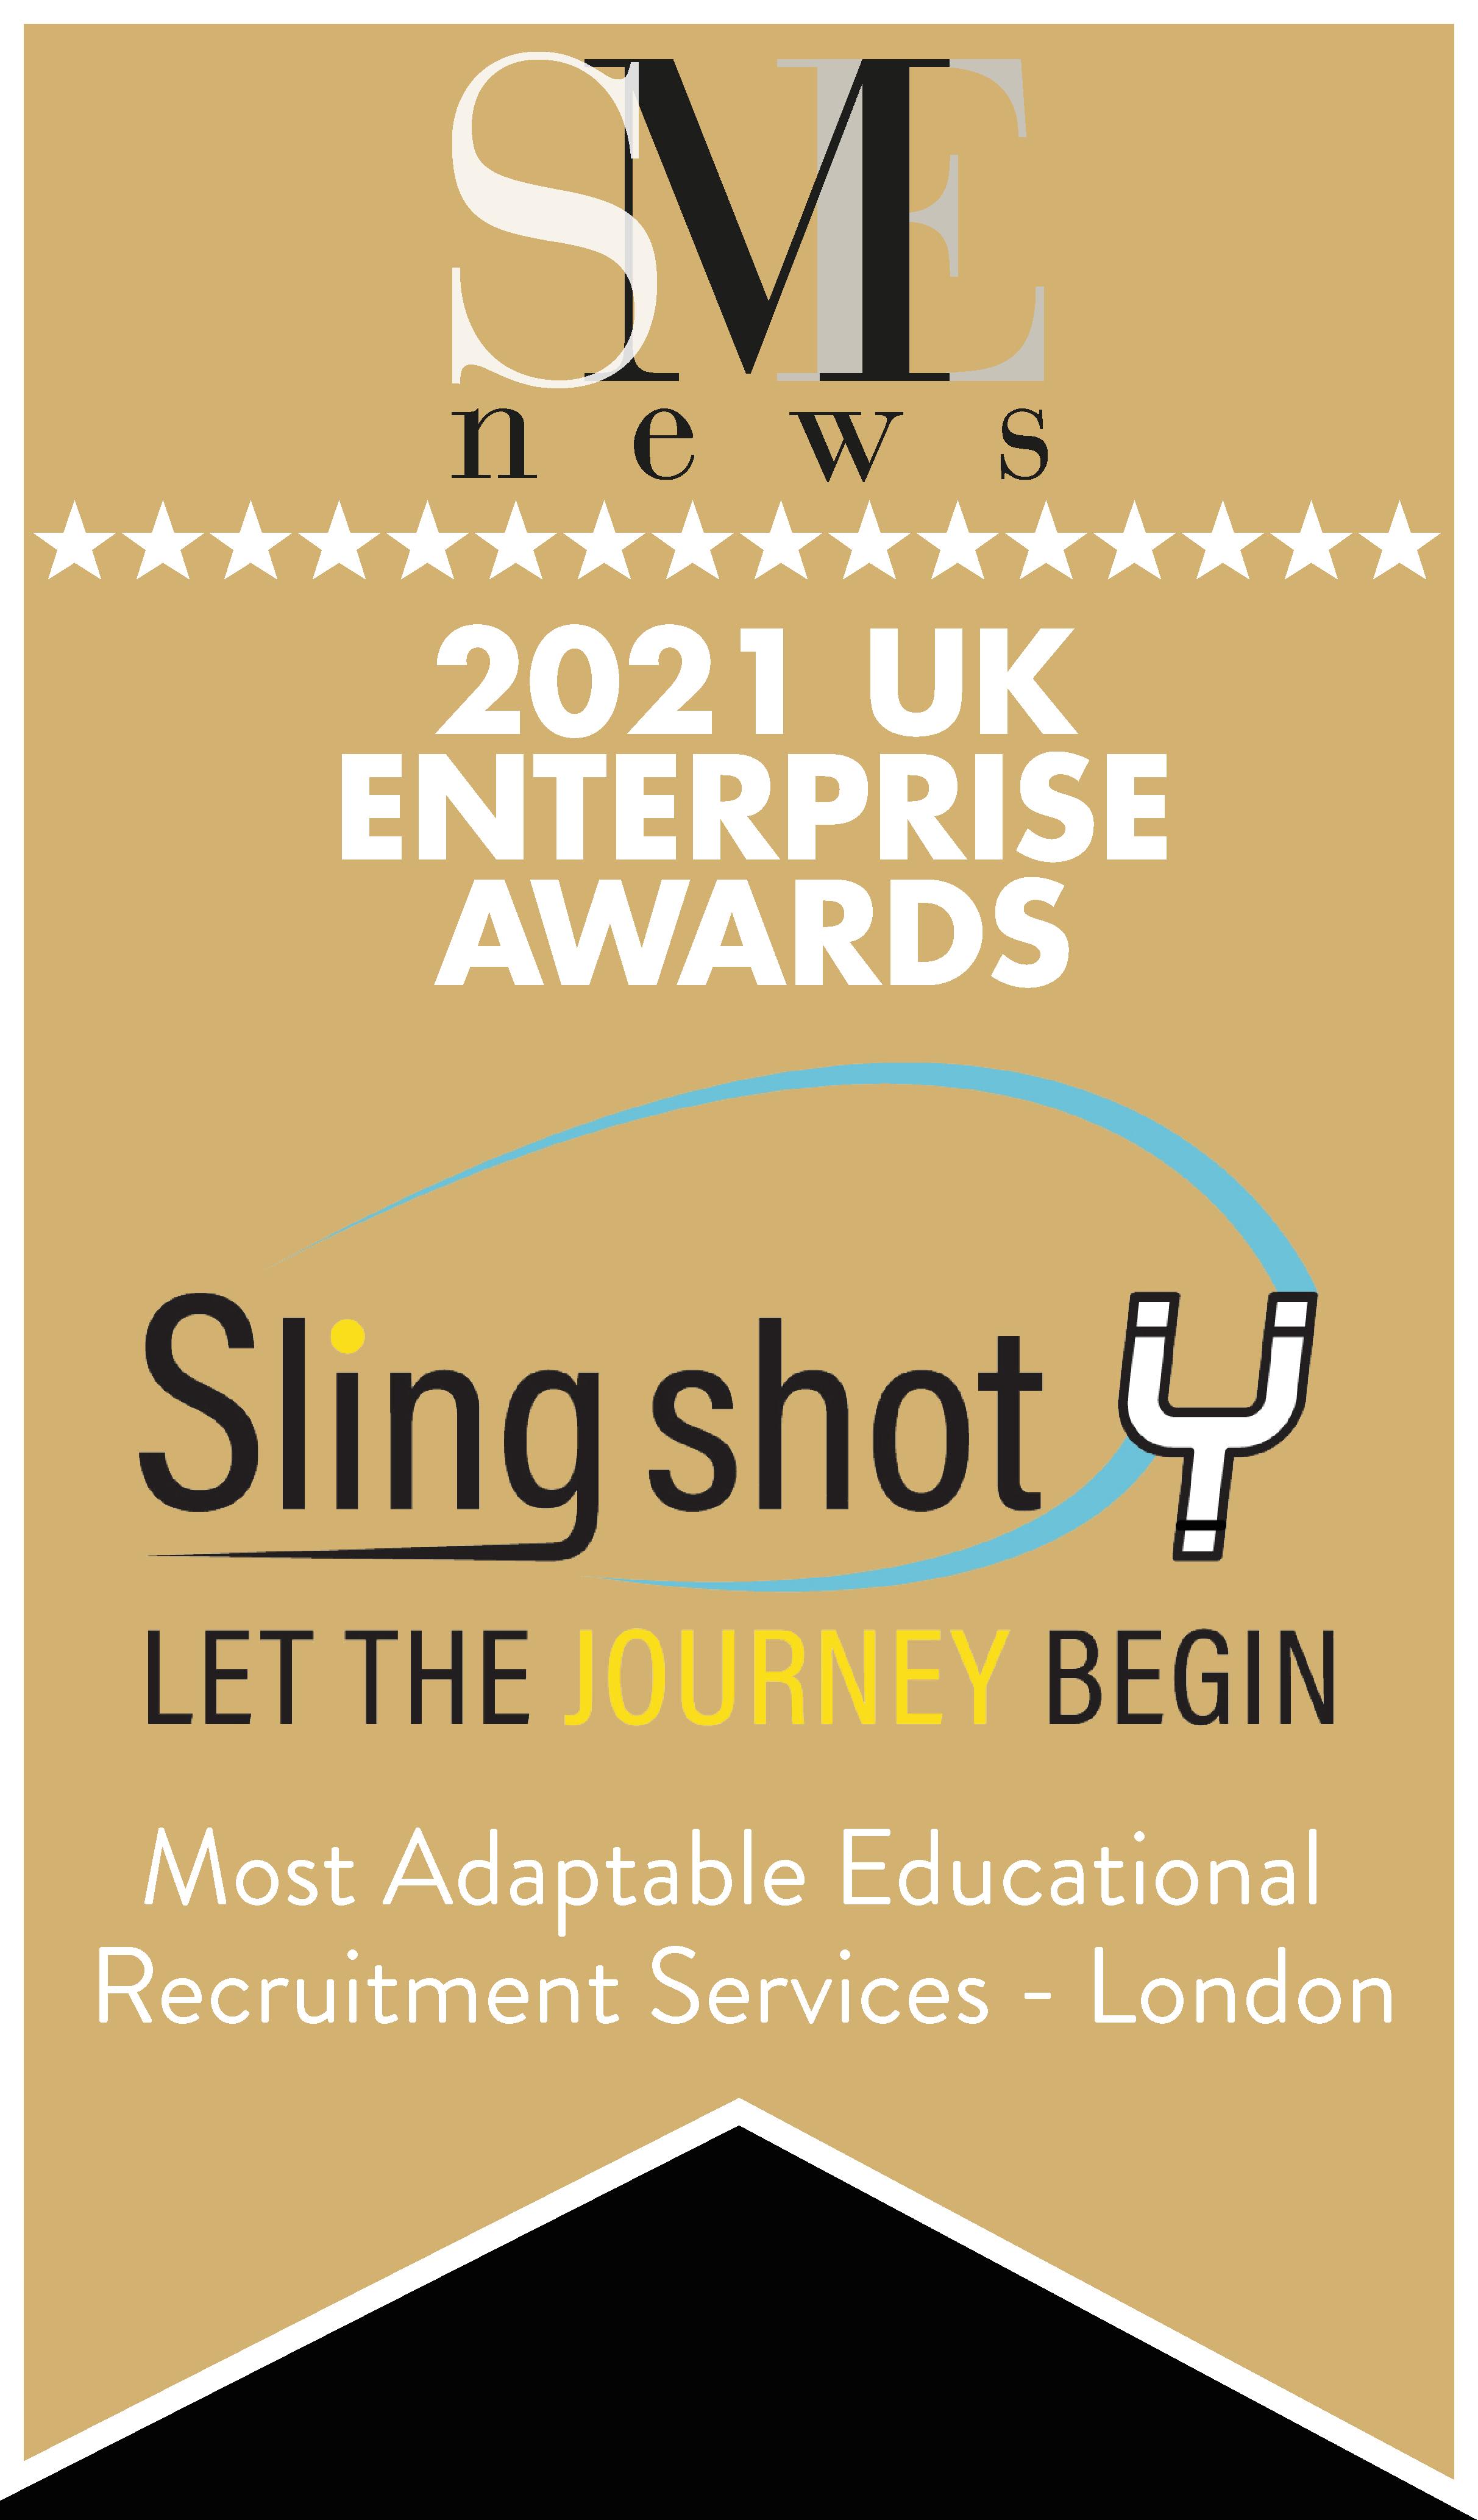 UK Enterprise award Slingshot Award